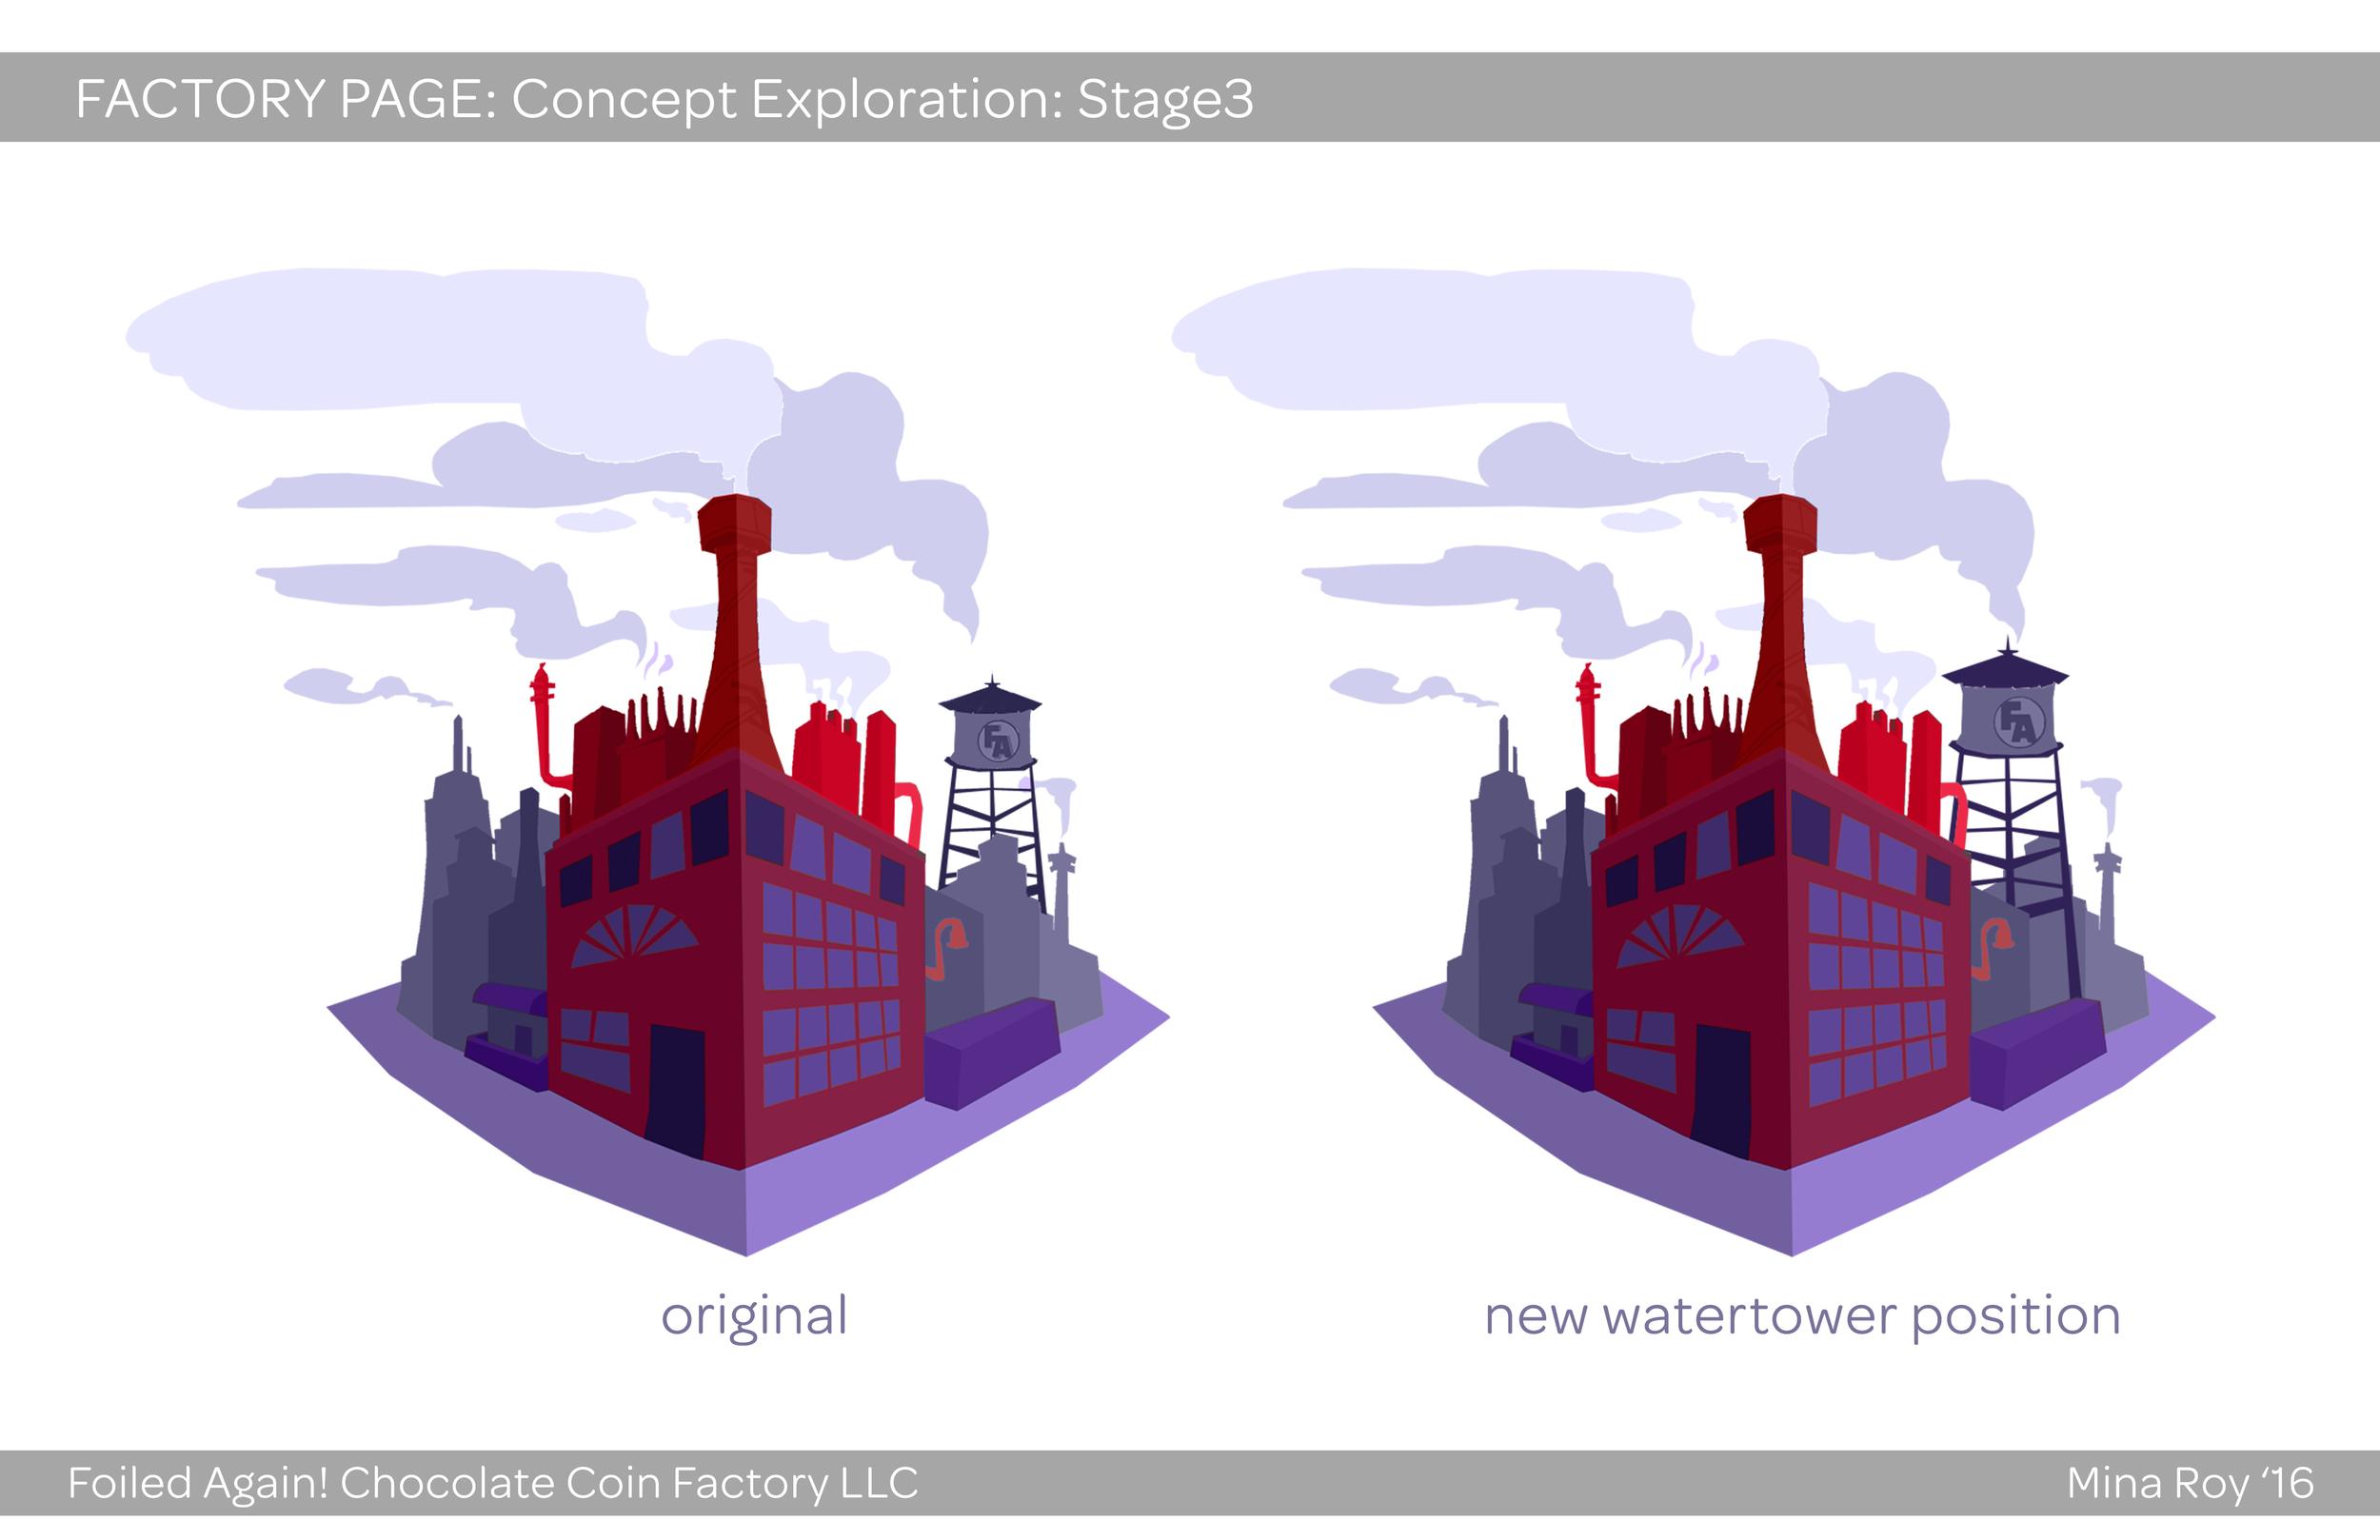 website-conceptdesign-factory-stage3.jpg